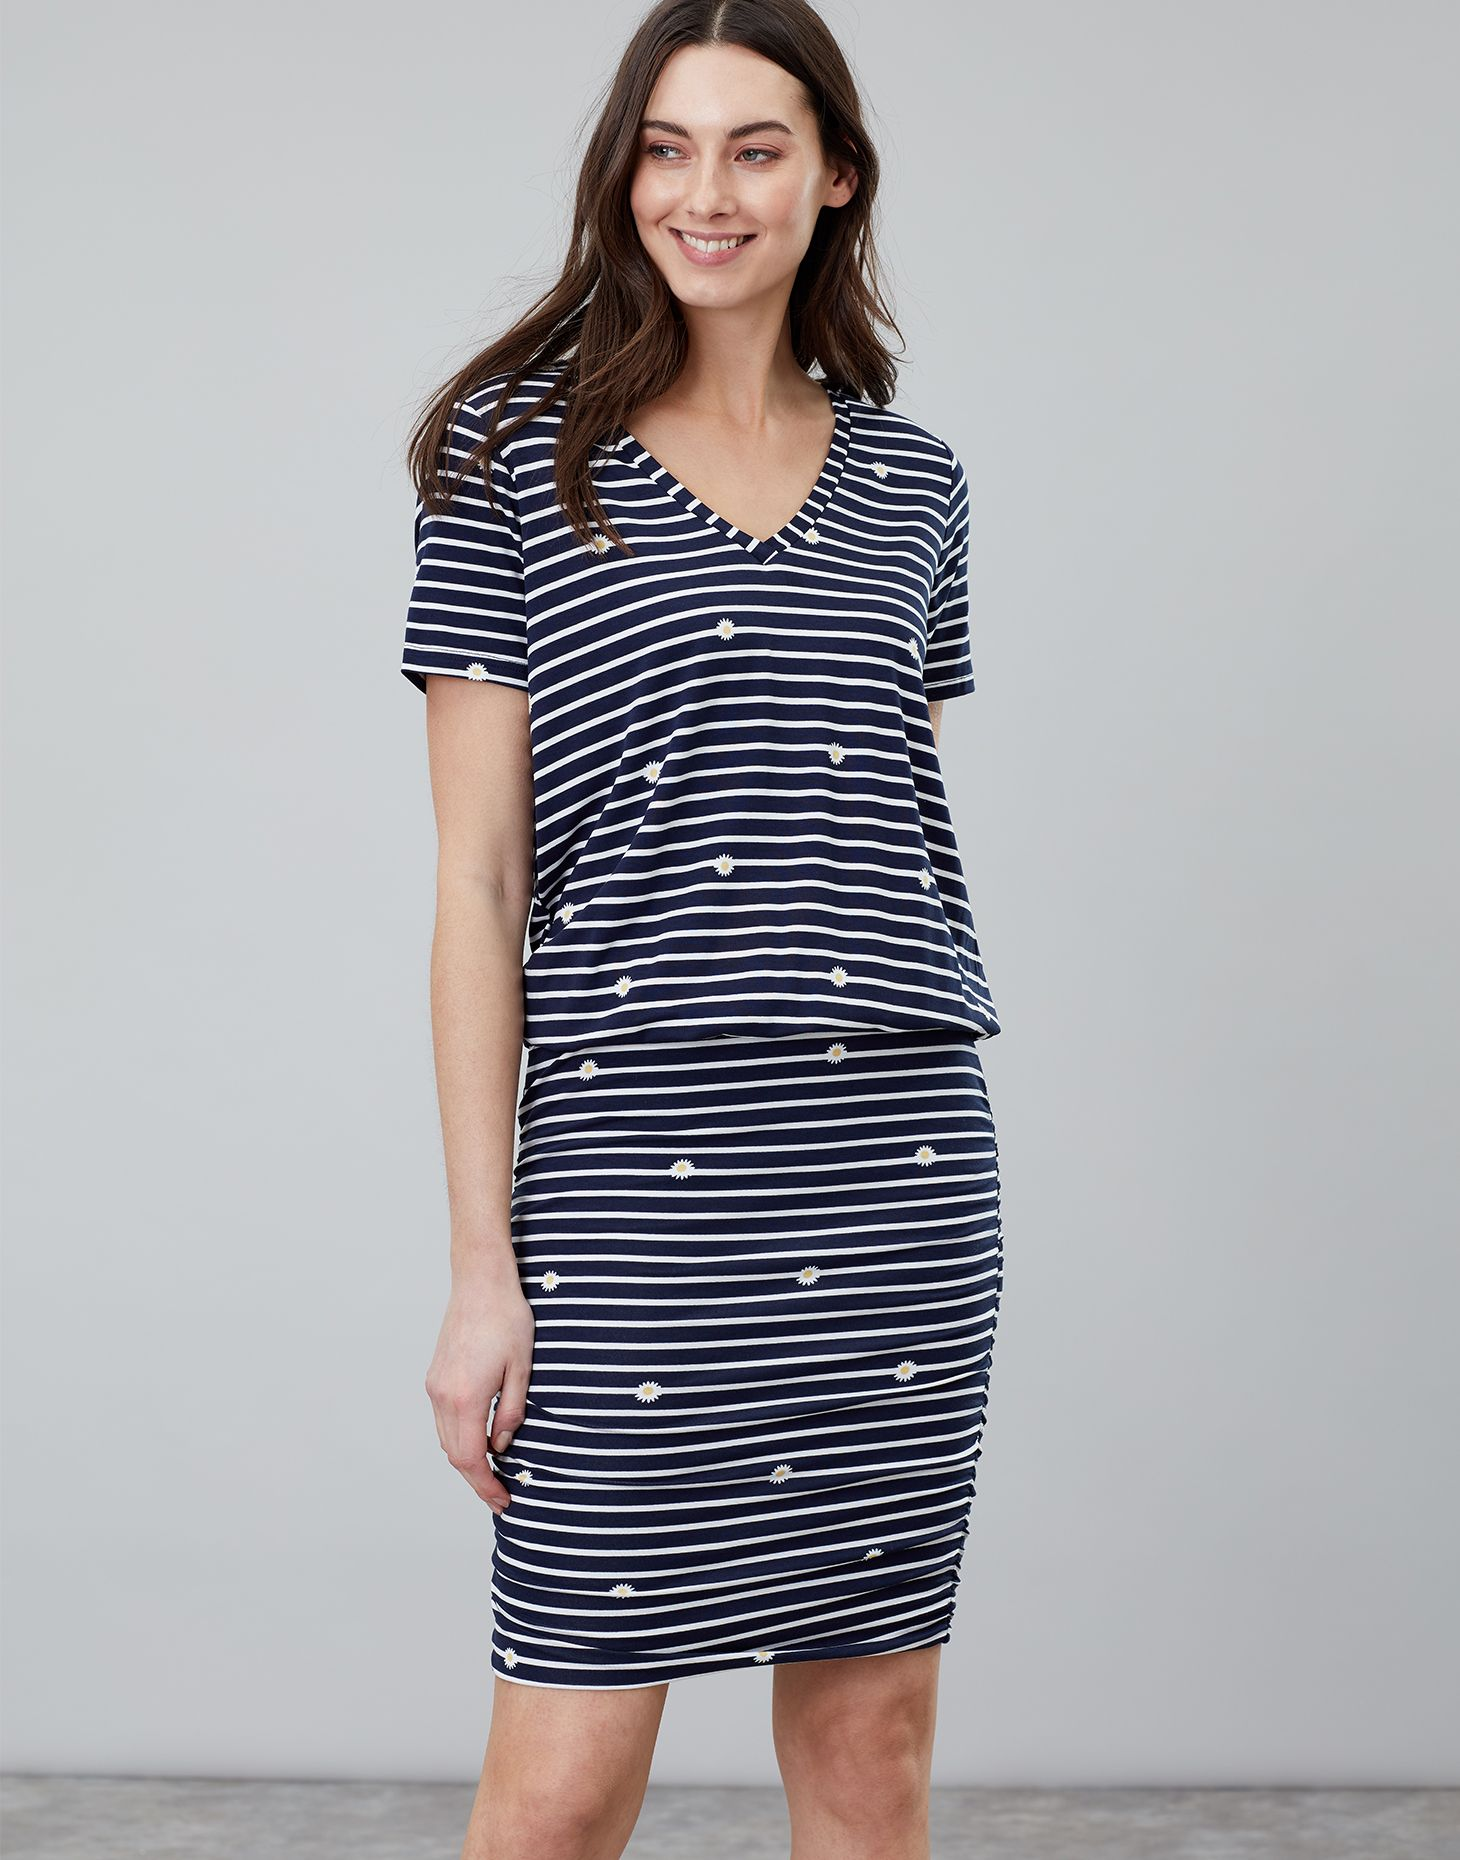 fb554b9819 Candice NAVY DAISY V Neck Jersey Dress With Gathered Skirt | Joules UK